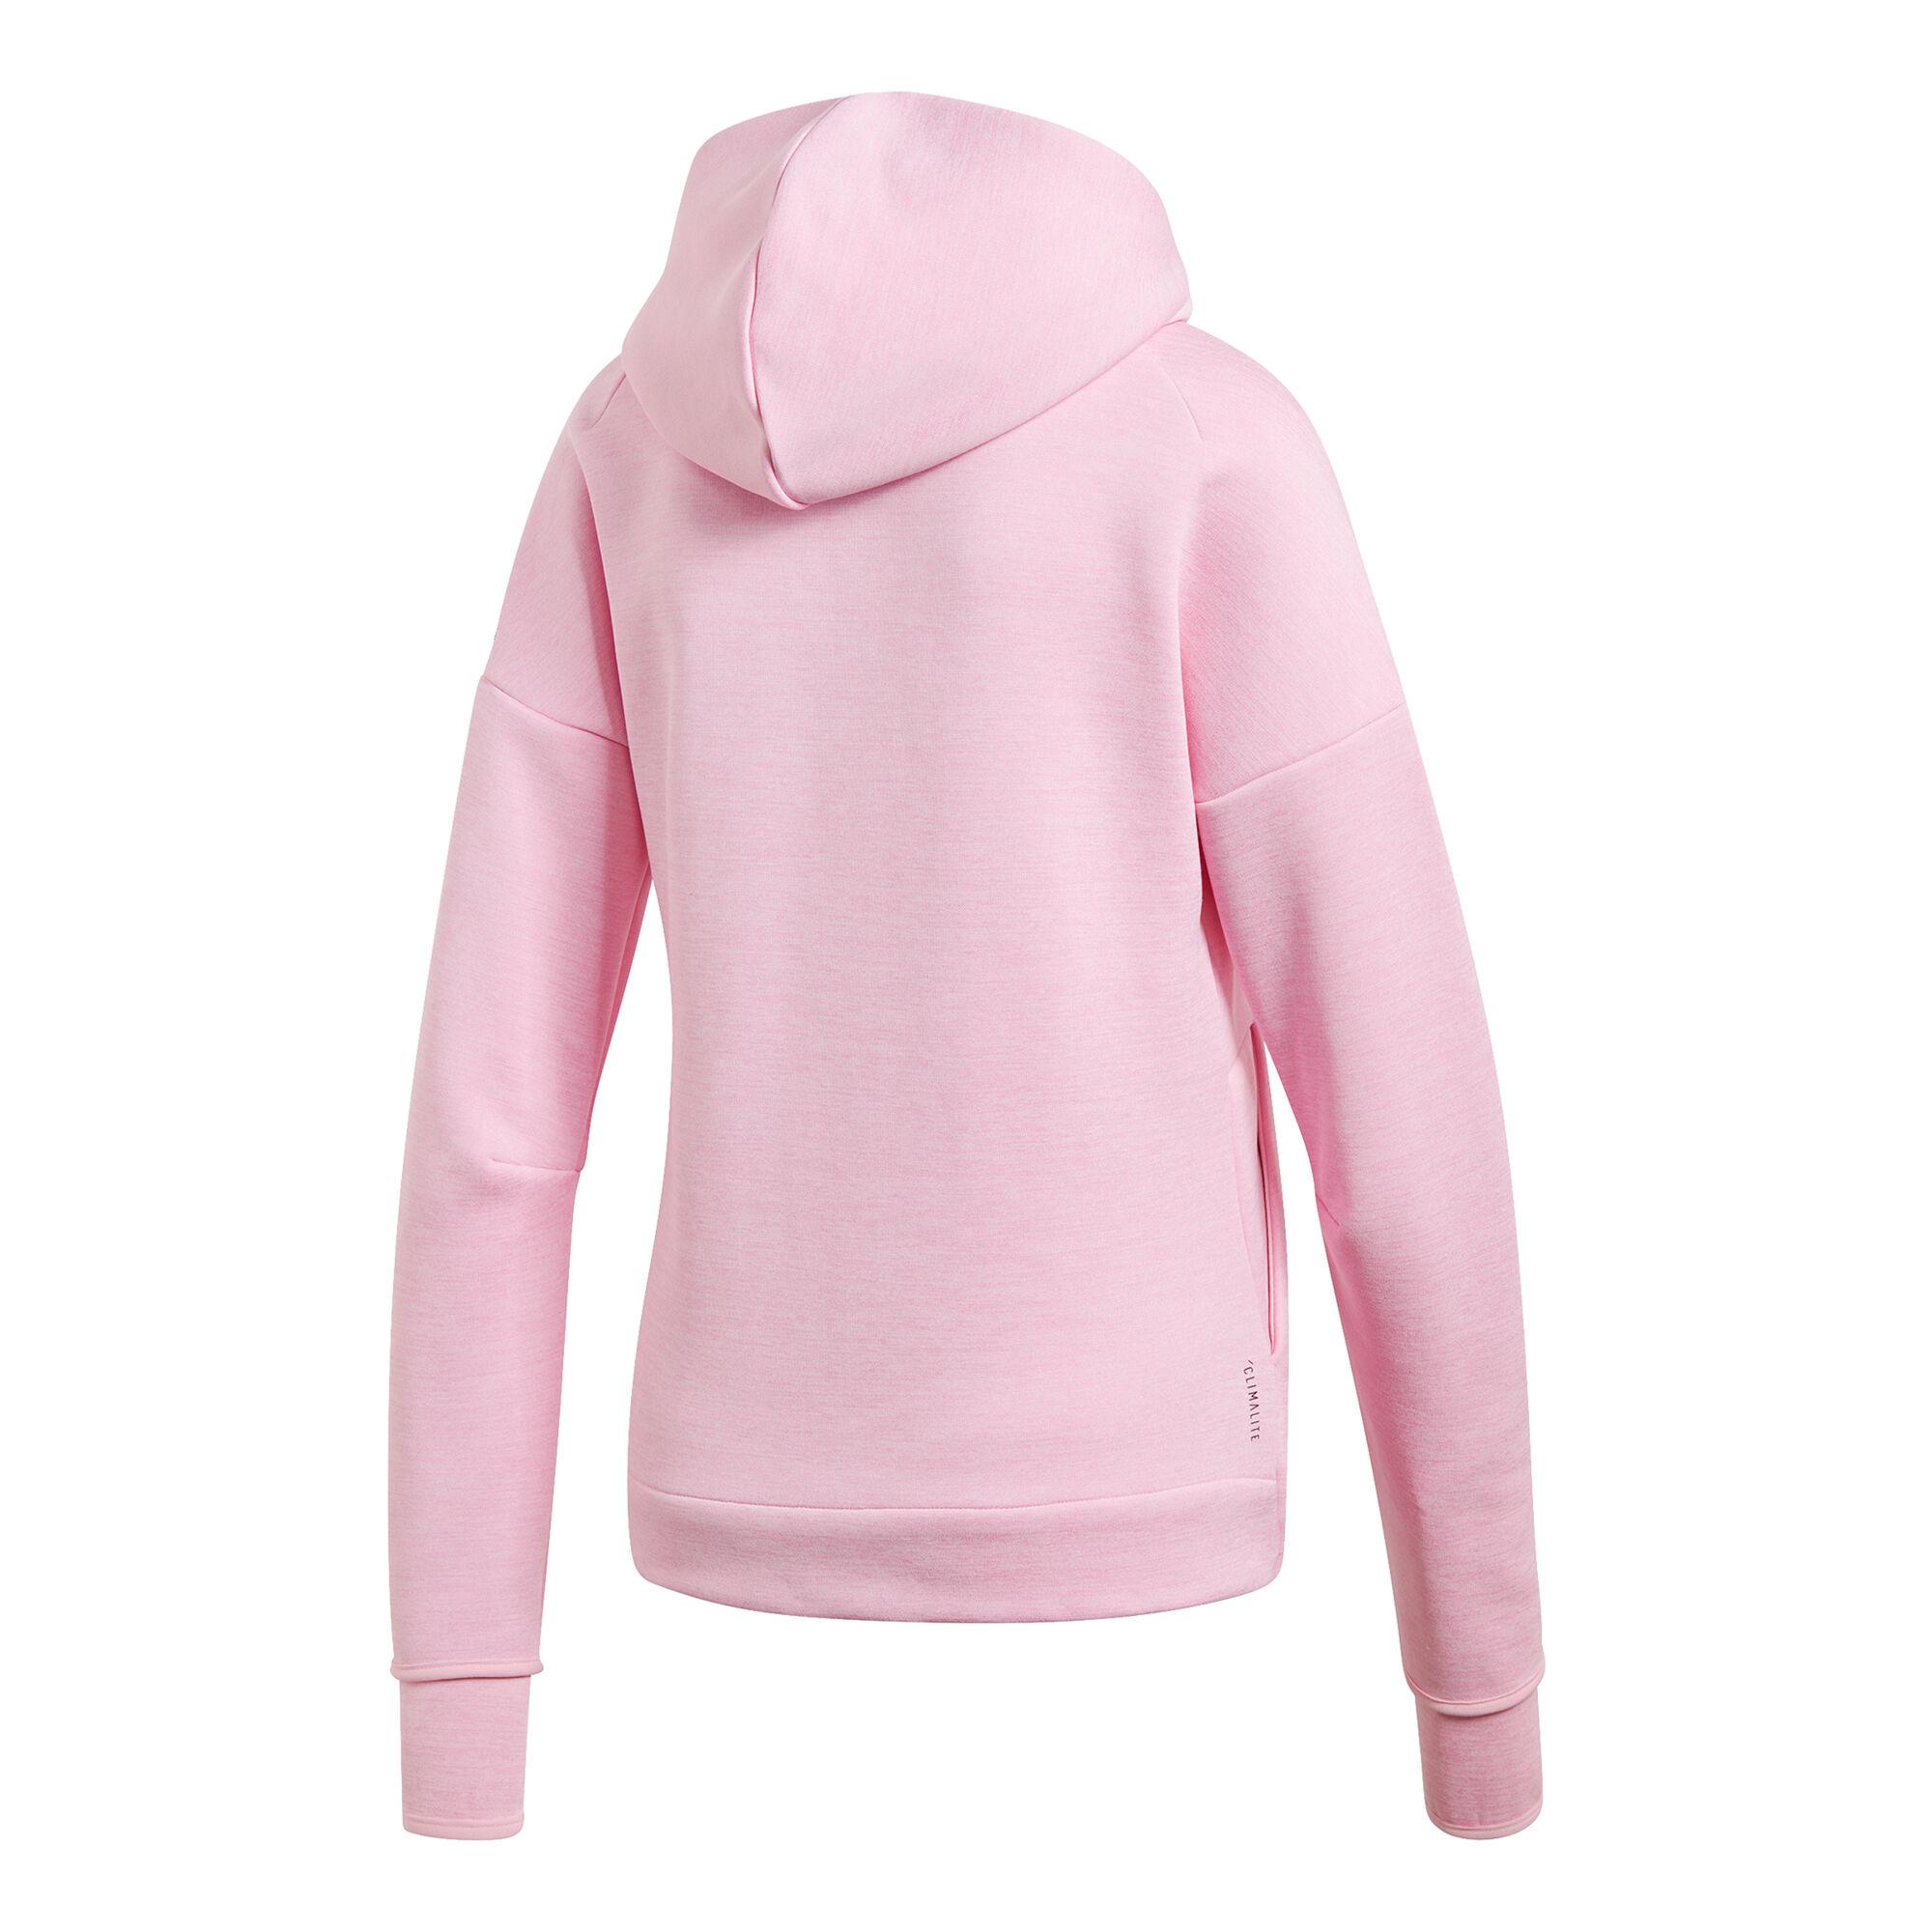 0d28bb129420 buy adidas Z.N.E. Fast Release Zipper Zip Hoodie Women - Pink